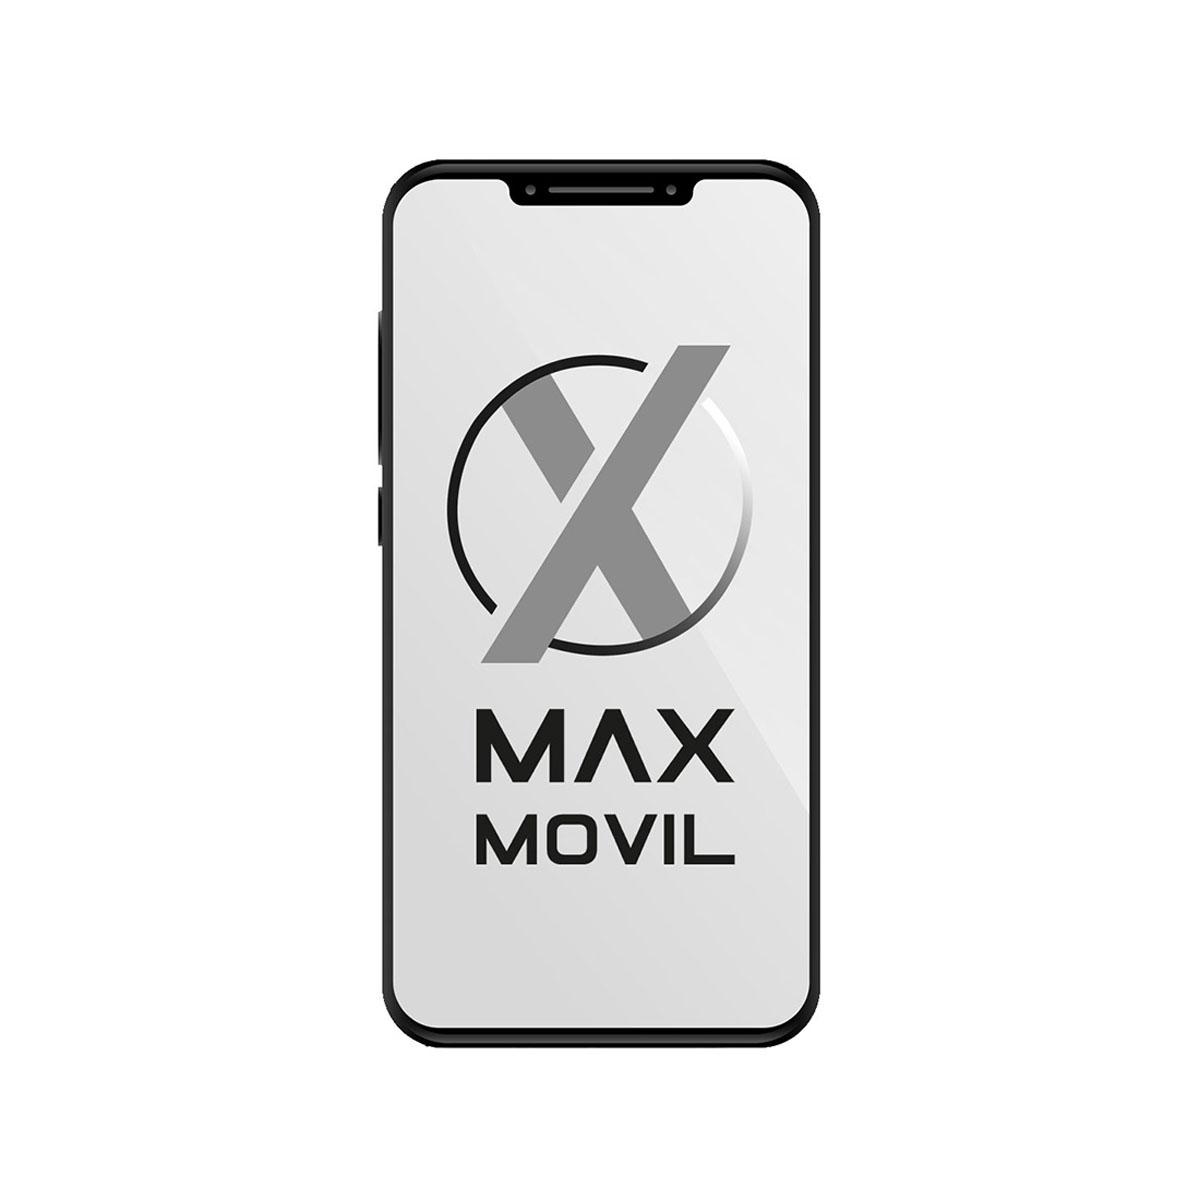 Adaptador de corriente USB-C de 96 W para MackBook Pro de Apple MX0J2ZM/A